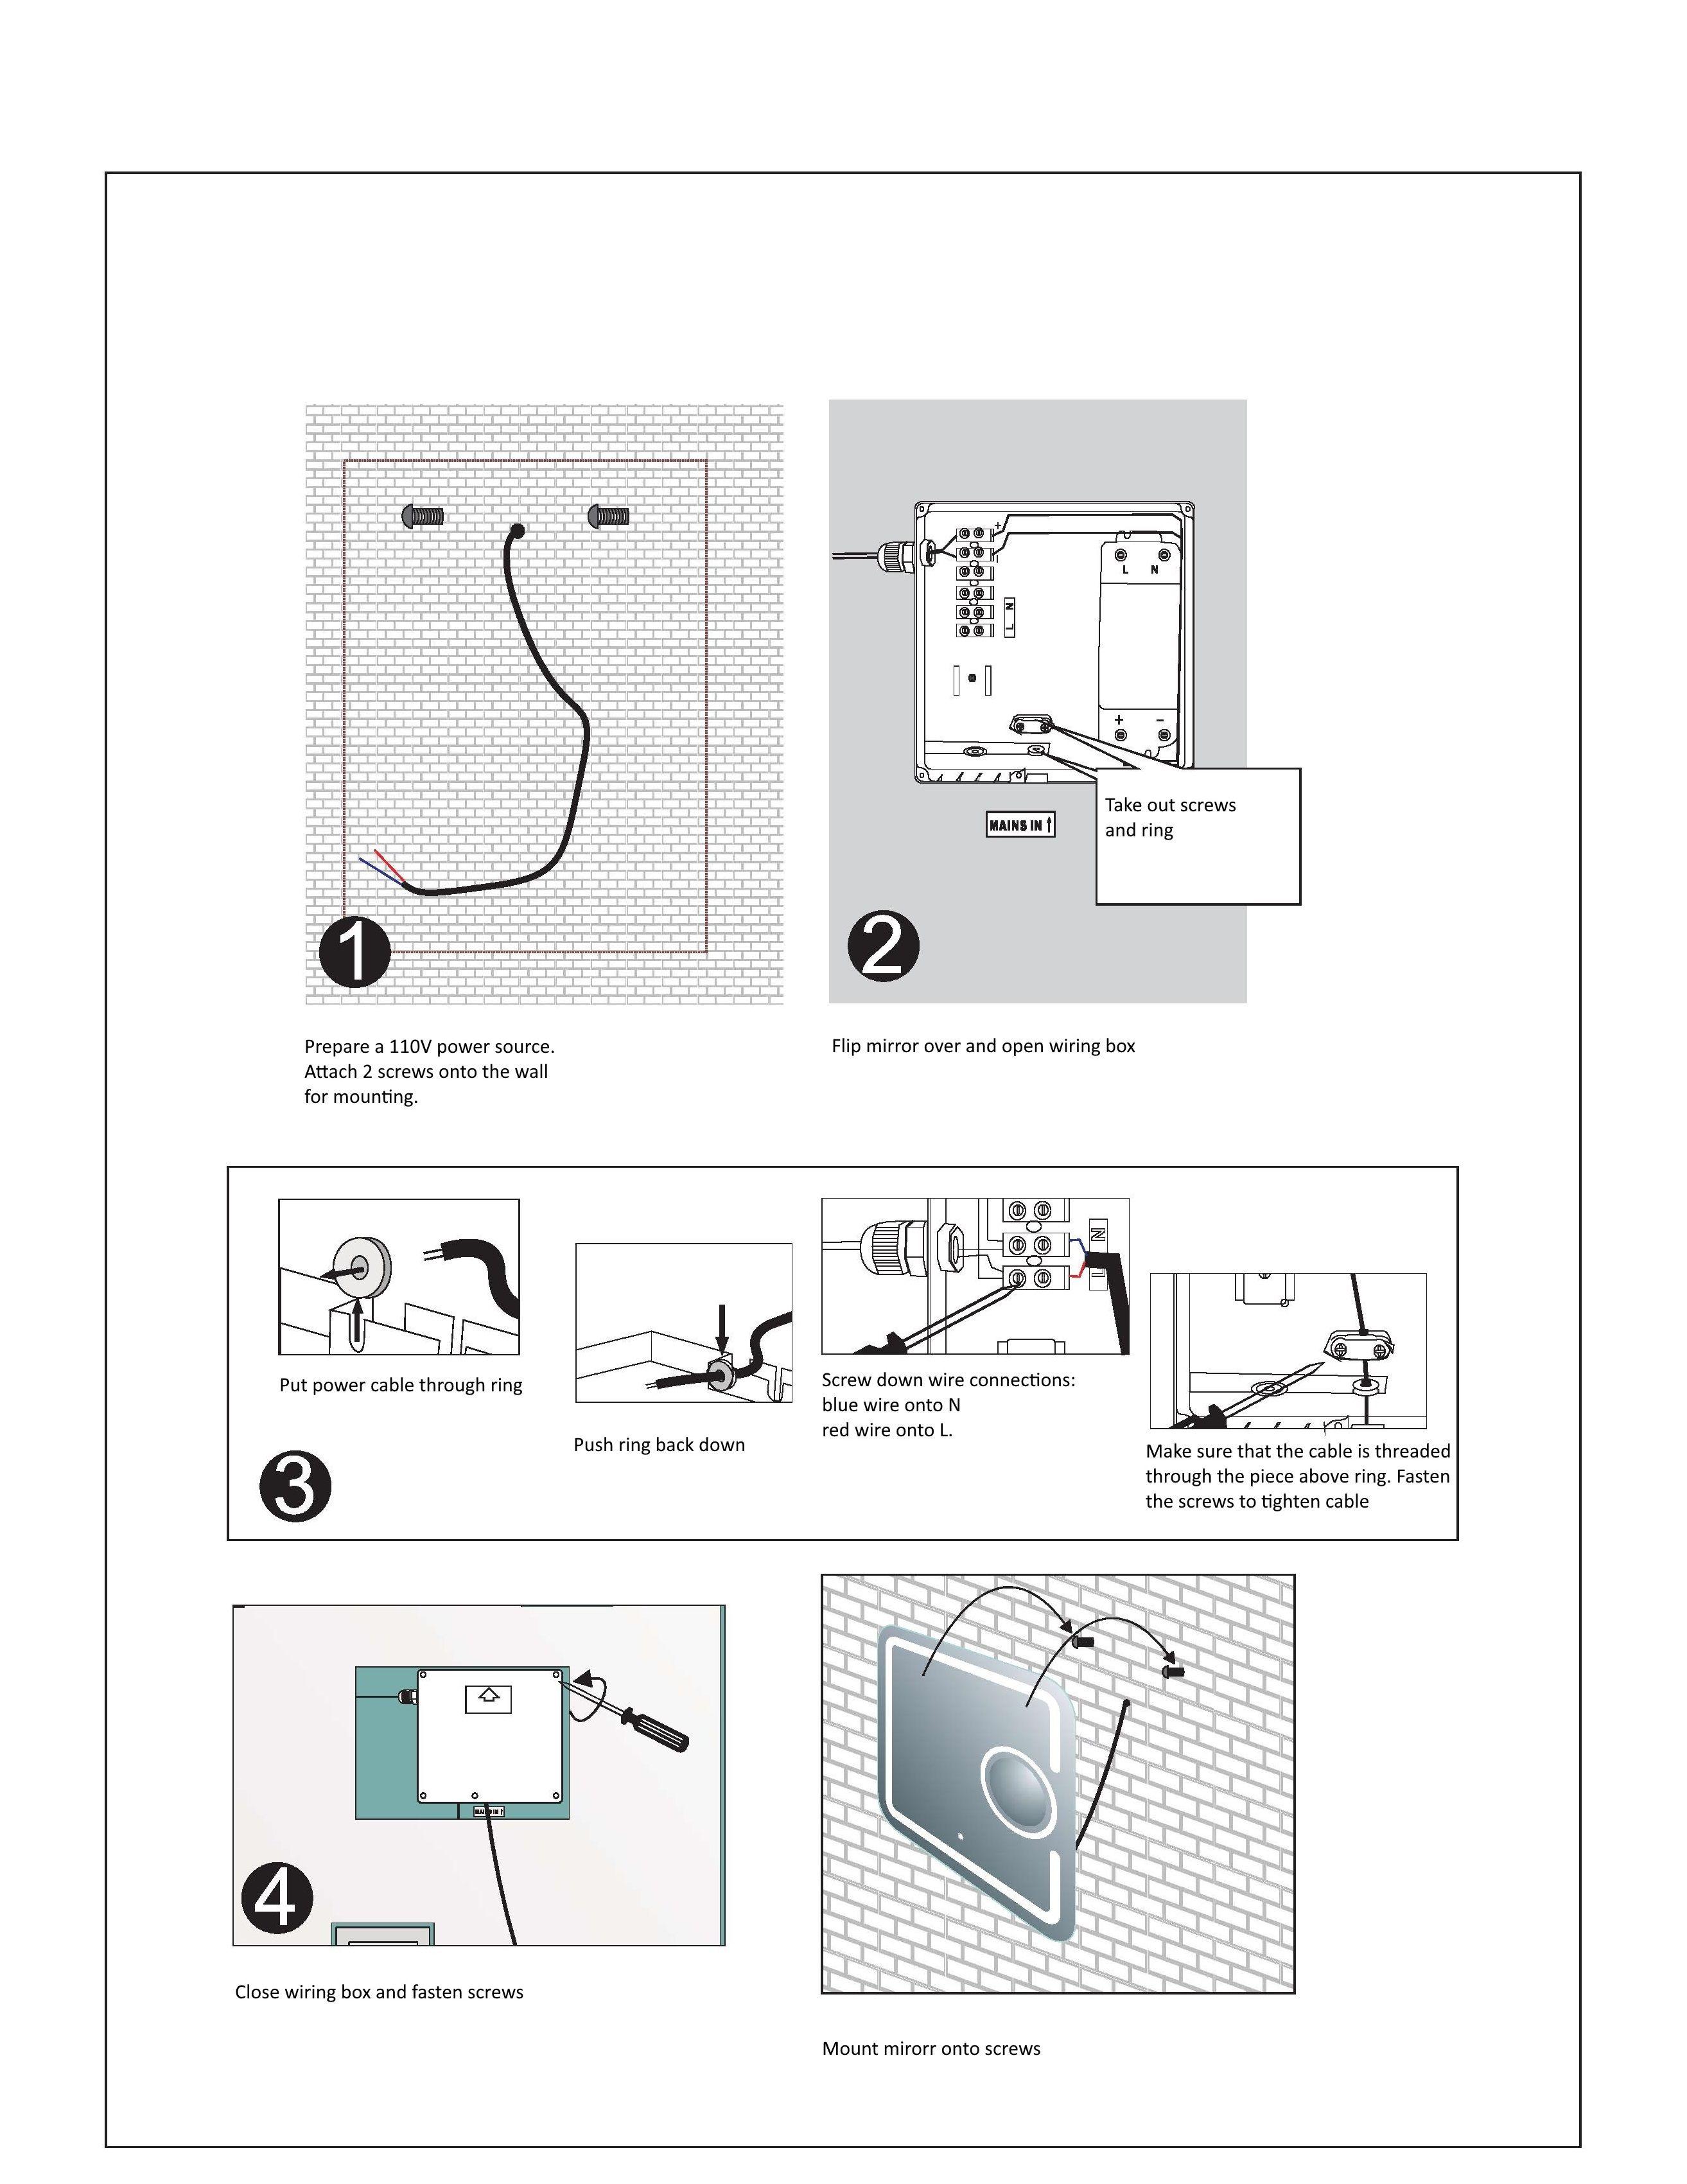 Led mirror wiring diagram circuit diagram symbols led mirror wiring diagram wire center u2022 rh mrguitar co 120v led wiring diagram simple led circuits swarovskicordoba Gallery